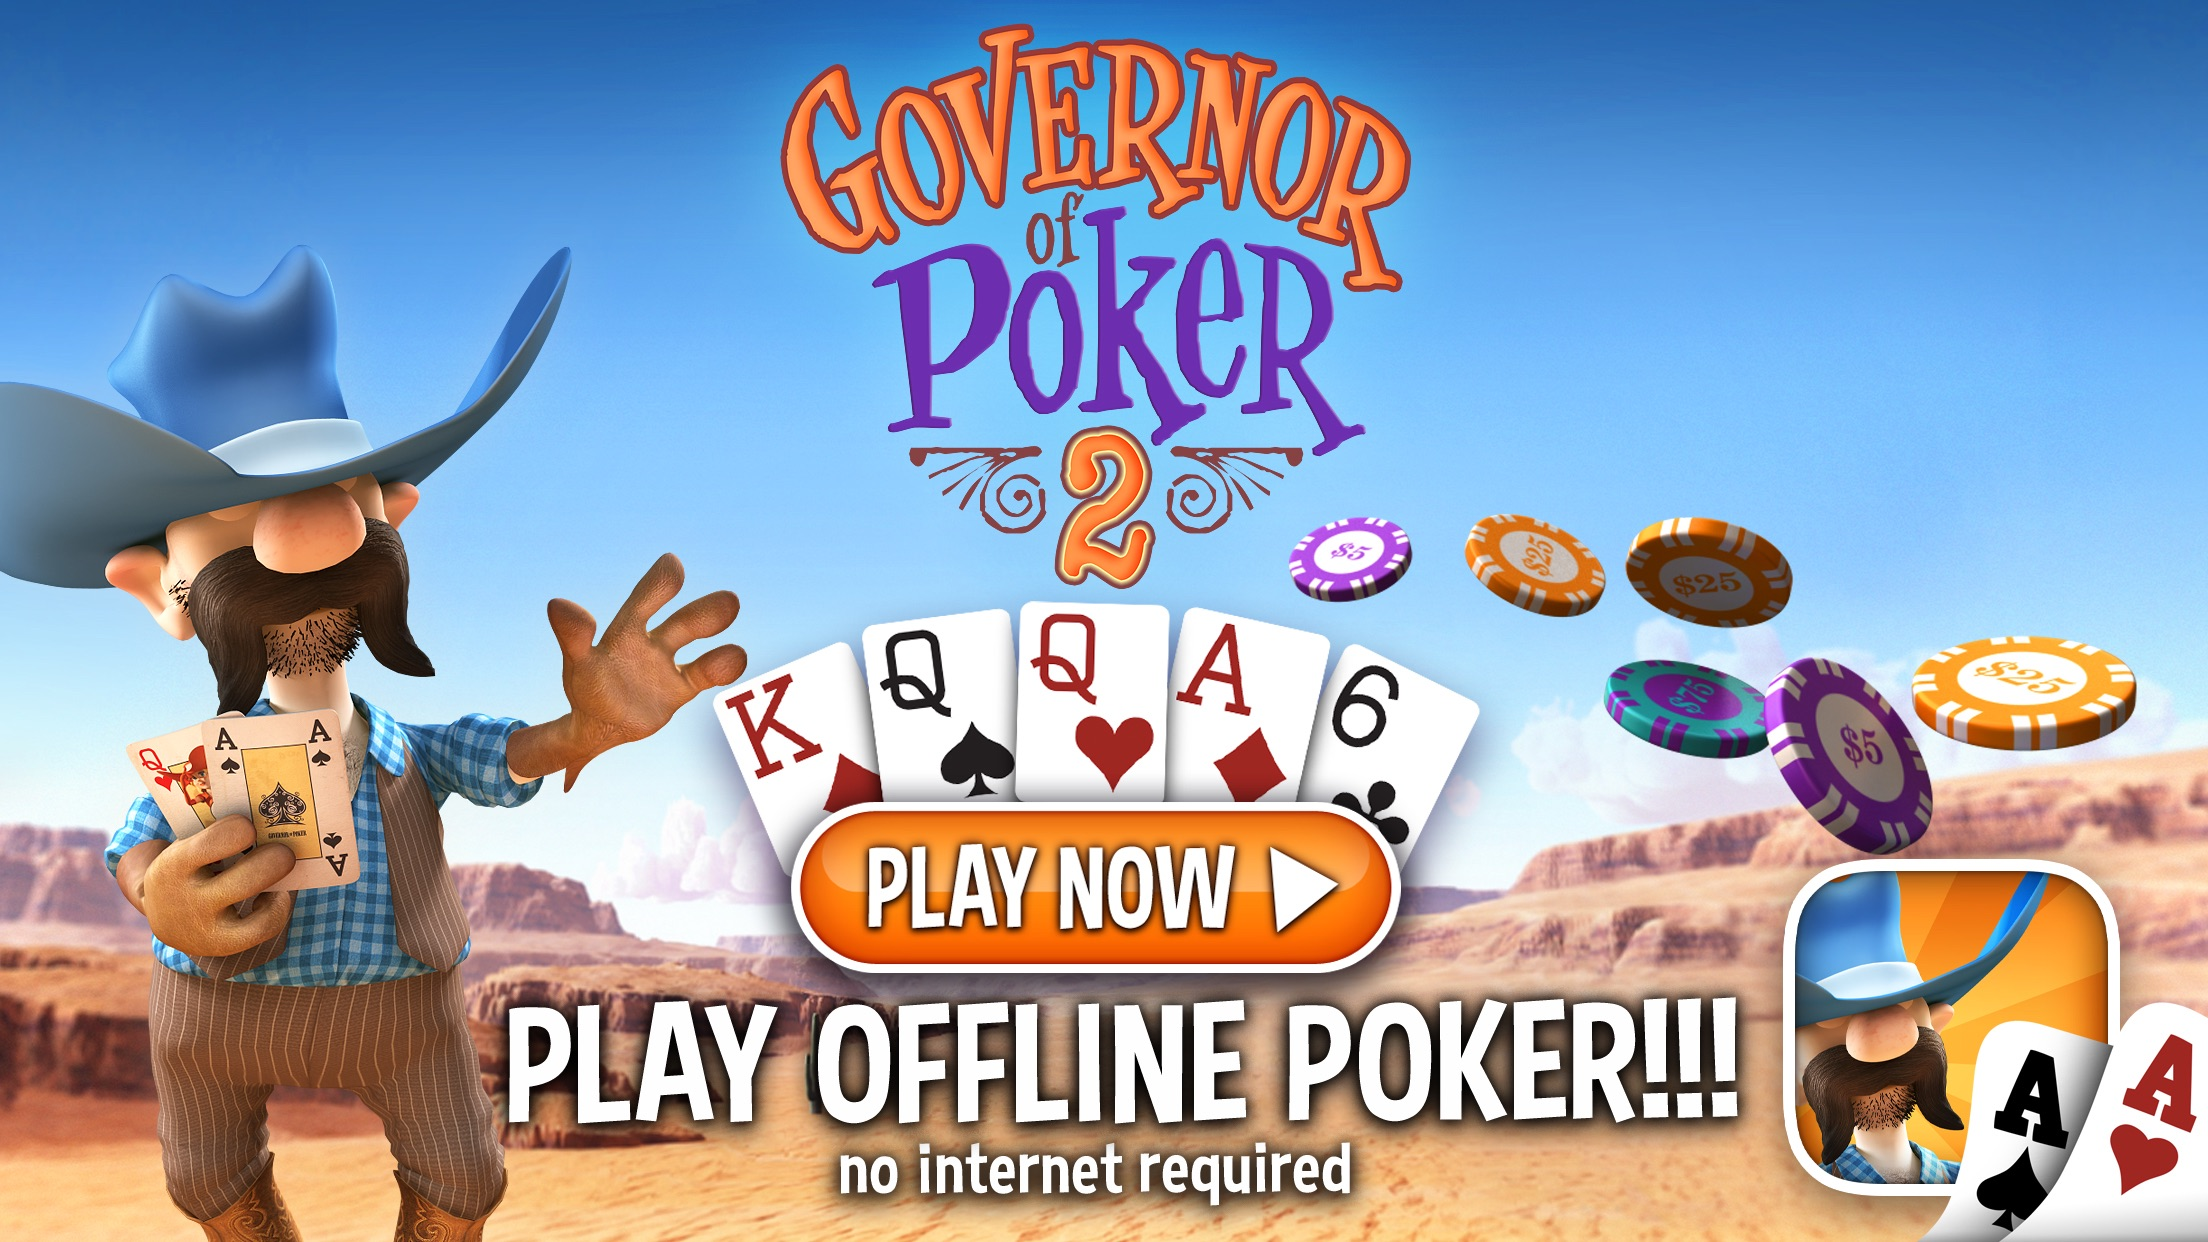 Governor of Poker 2 - Texas Holdem Poker Offline Screenshot